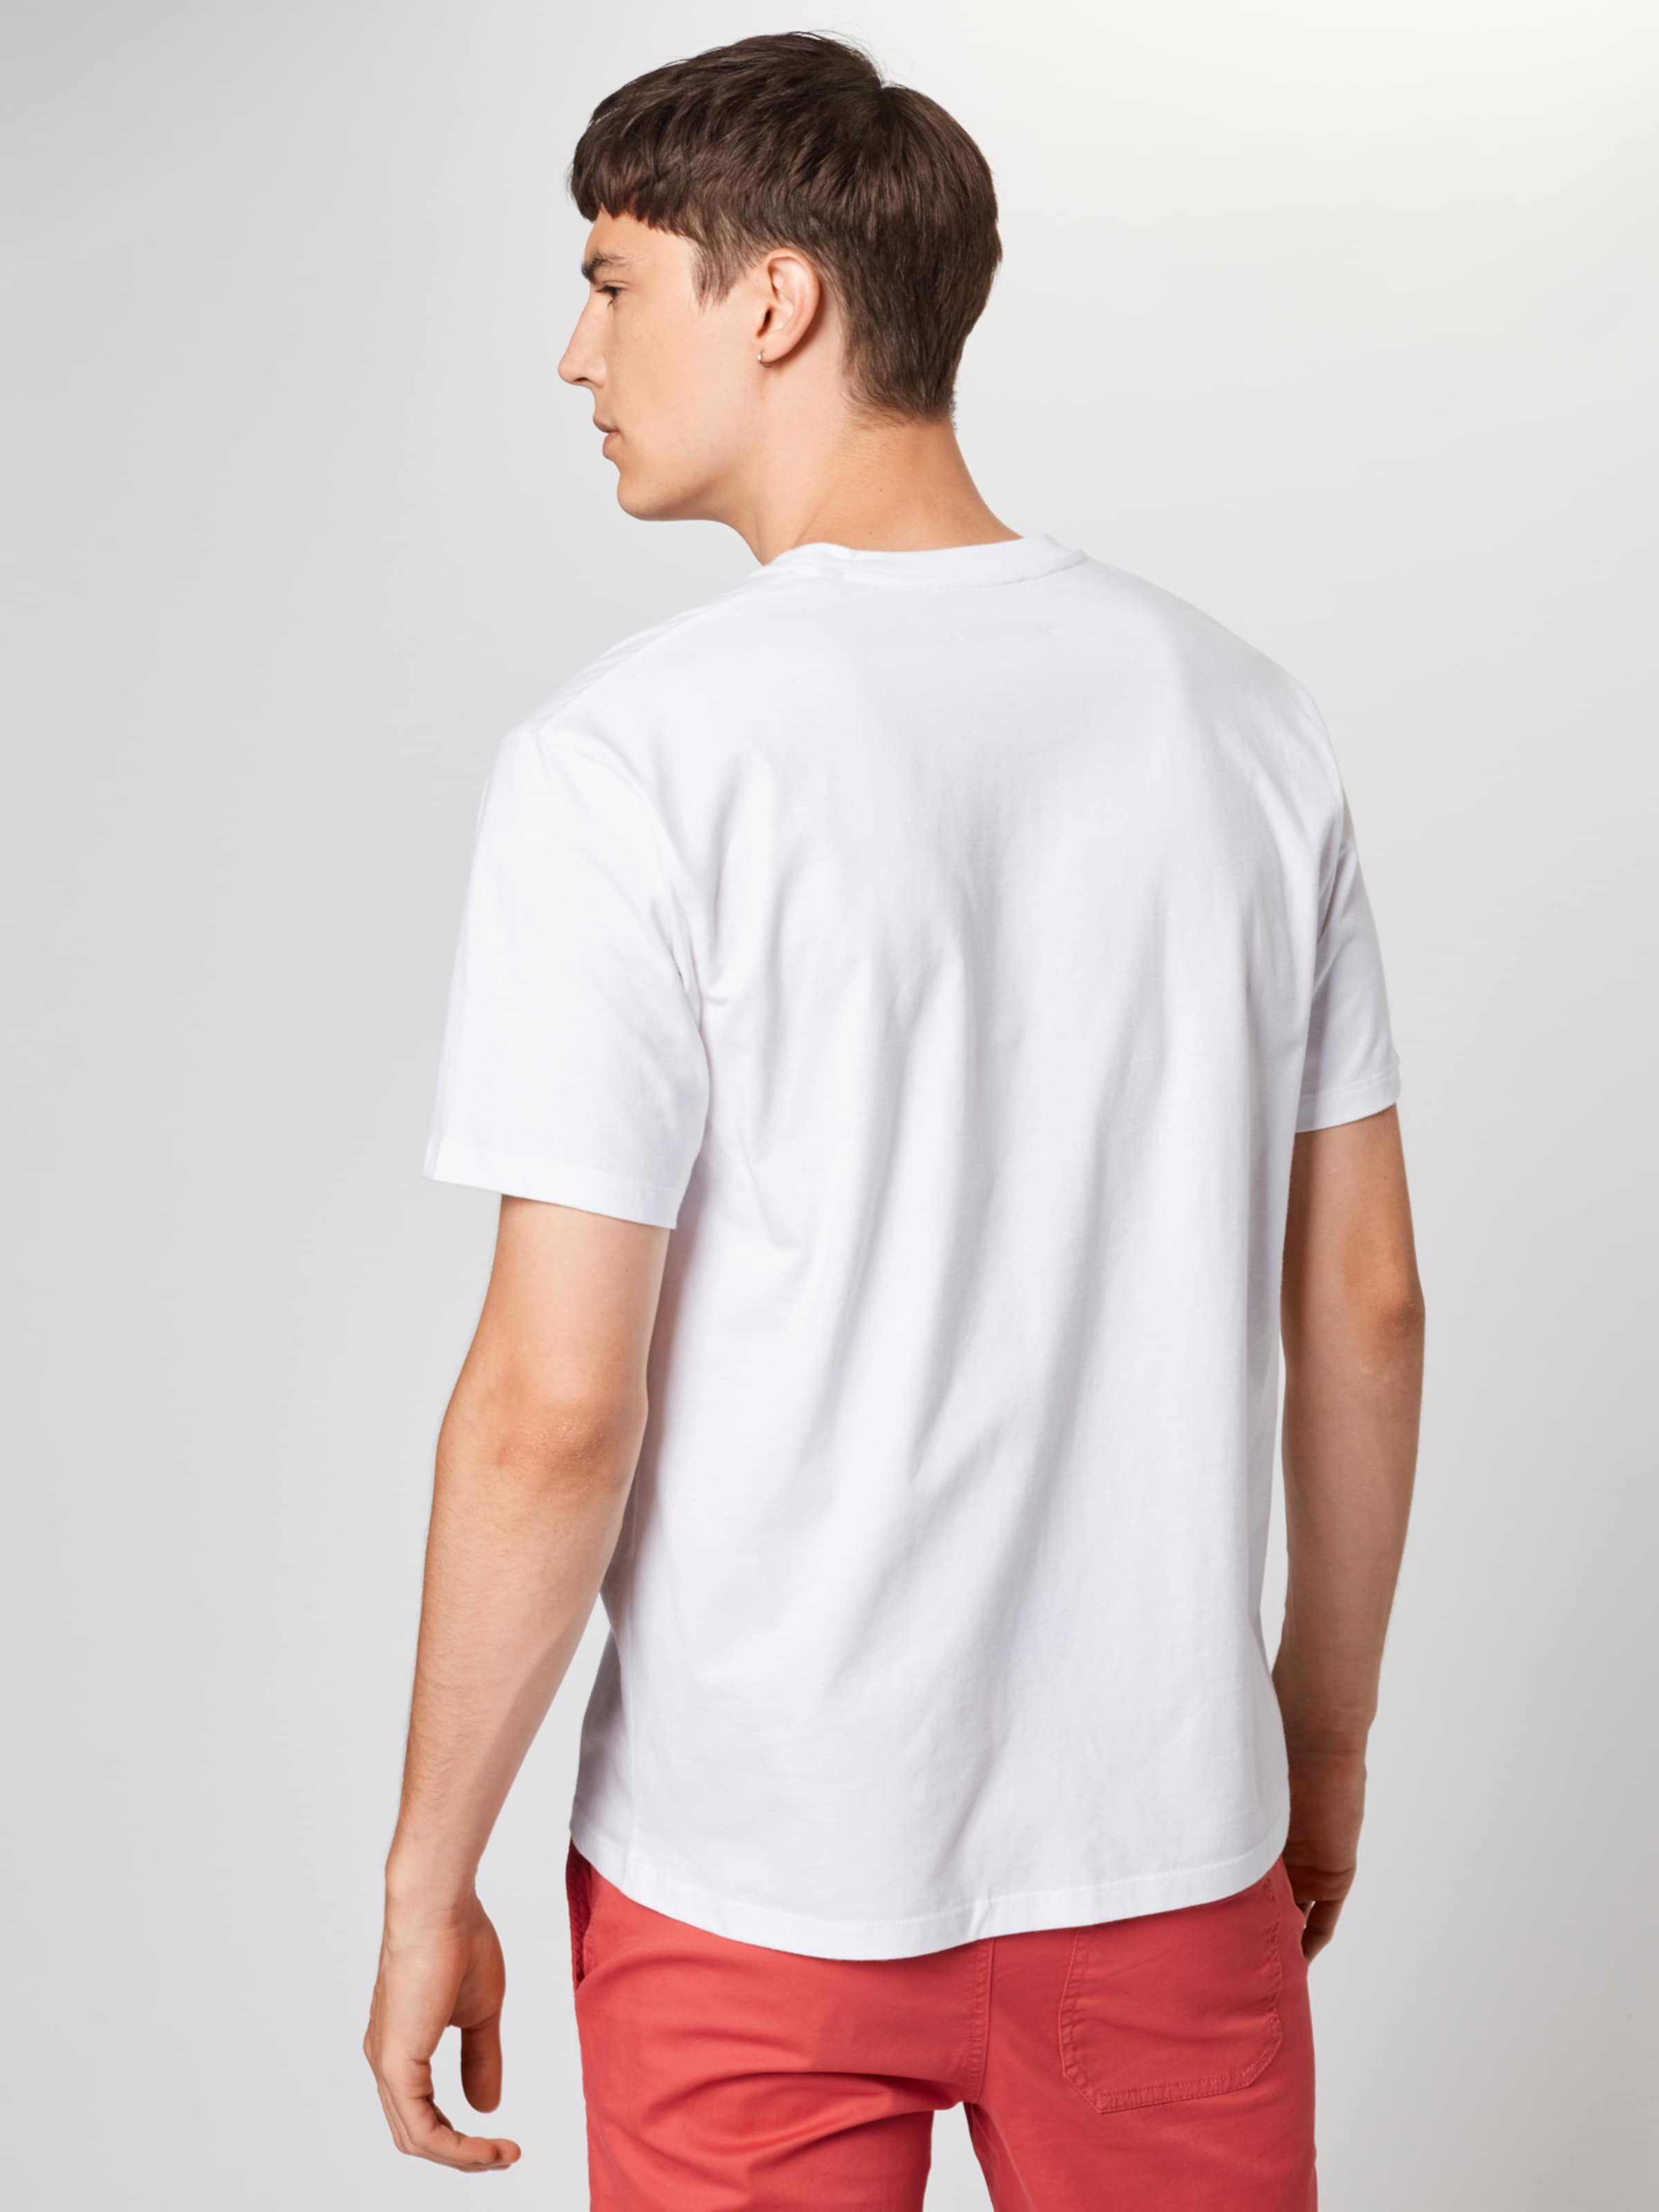 Kooples T shirt The In BlauWeiß mNOn0y8wv